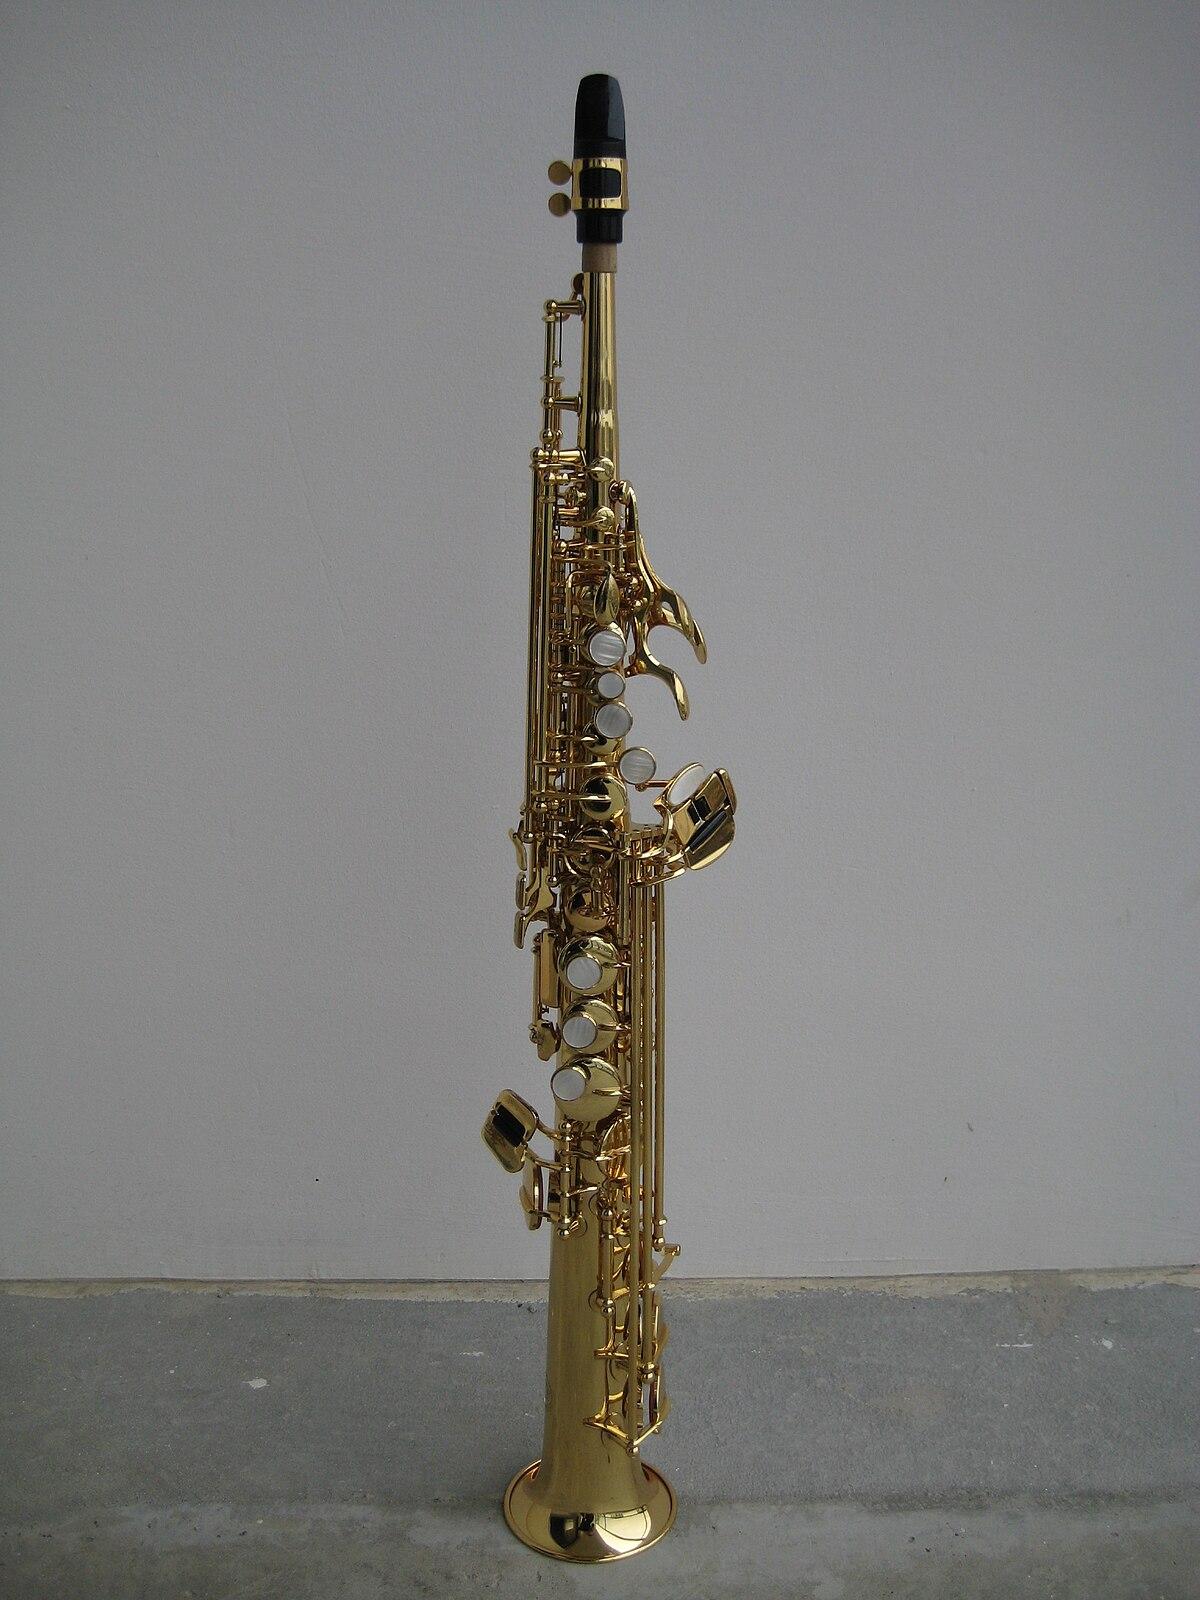 Keilwerth Tenor Sax Vs Yamaha Tenor Saxophone